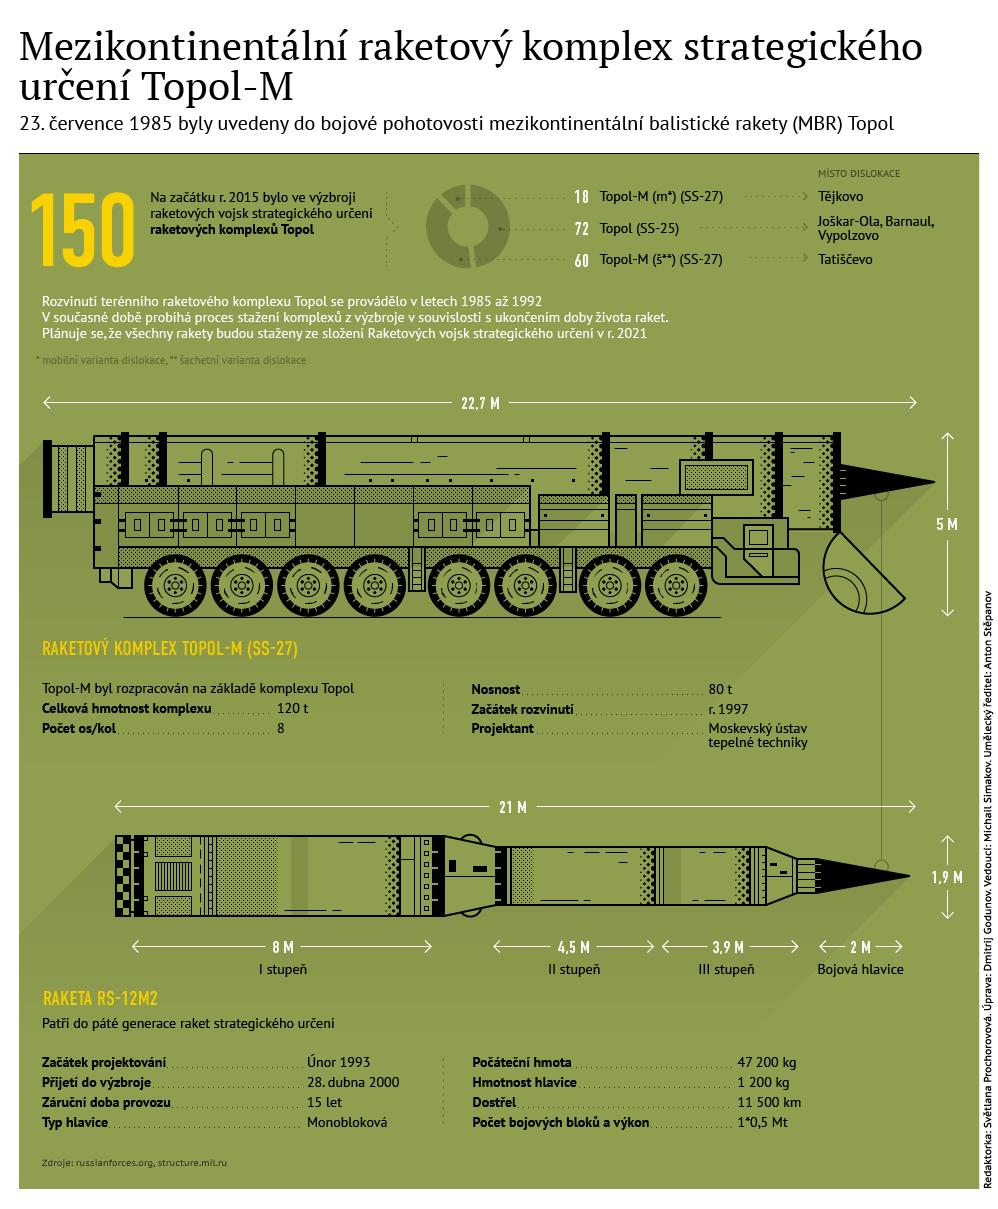 Charakteristiky raketového komplexu Topol-M